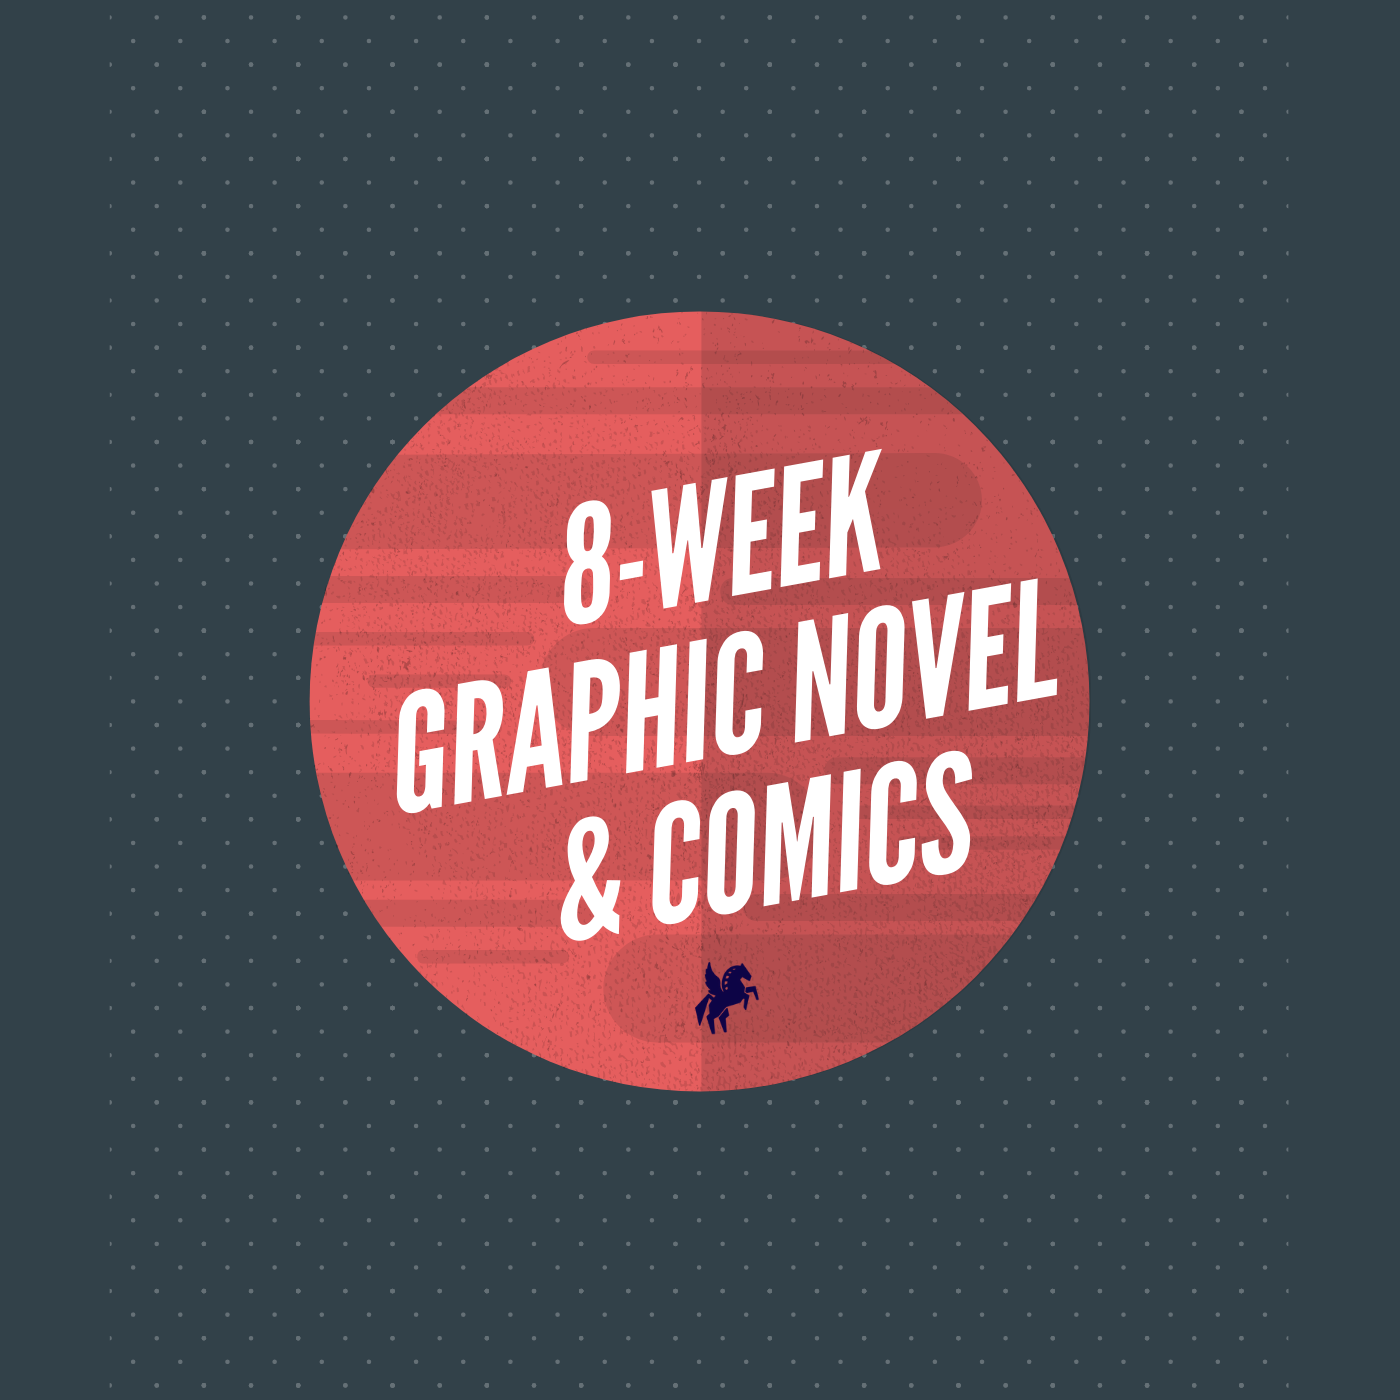 8-Week Graphic Novel & Comics-1.png